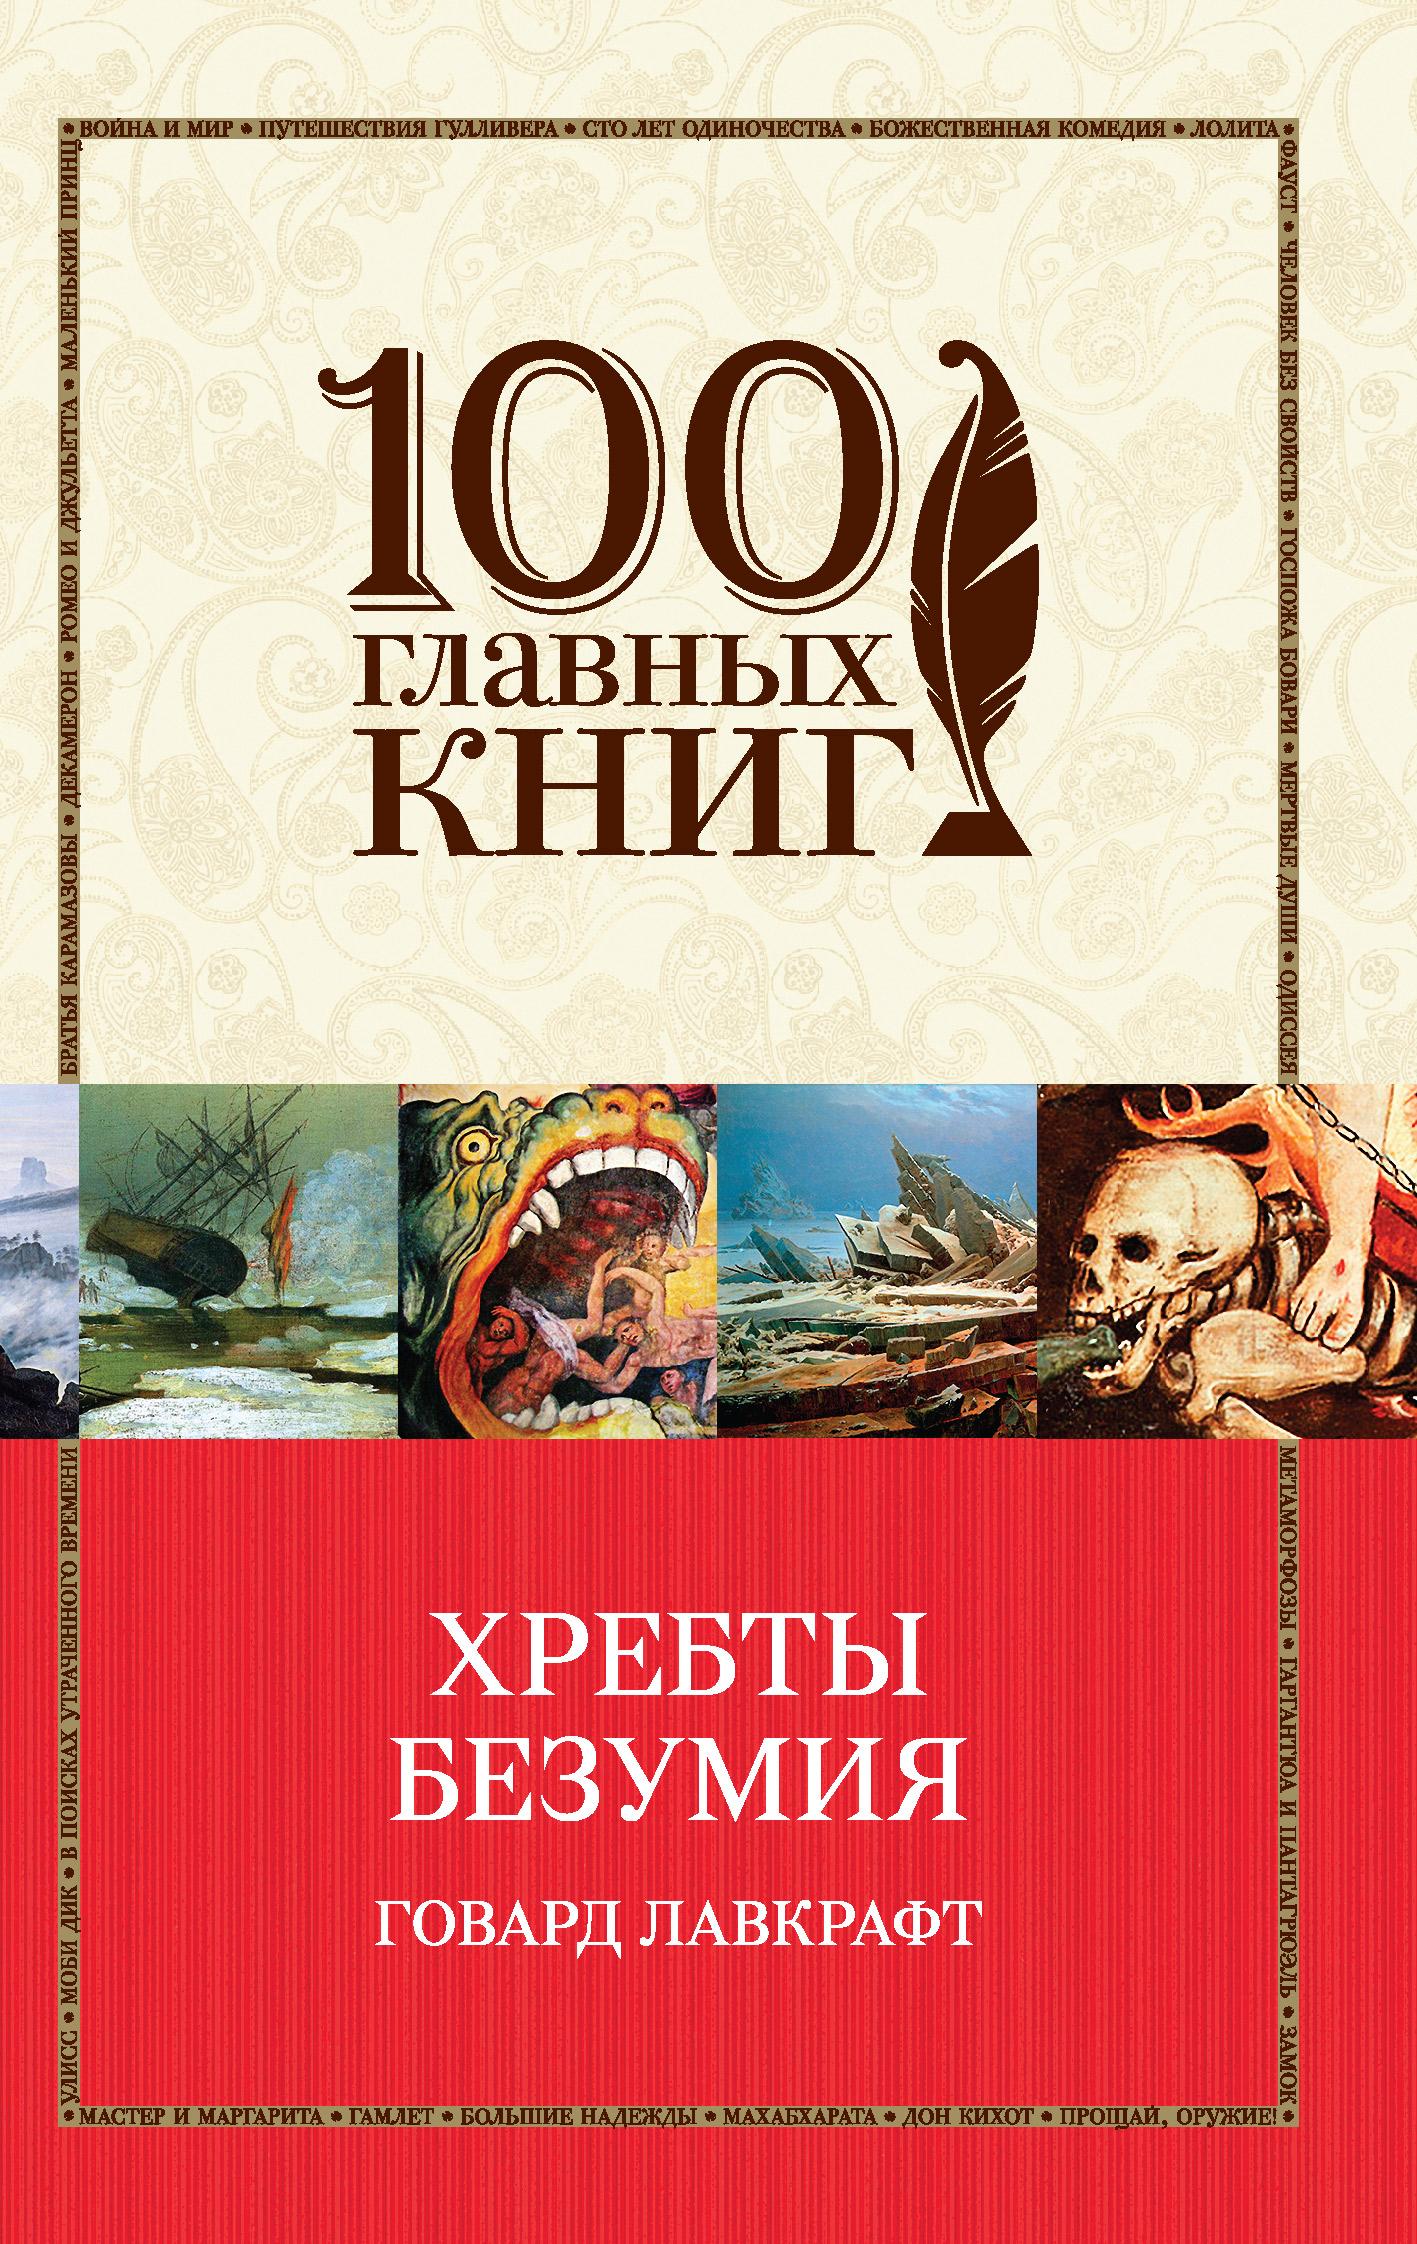 Говард Лавкрафт Хребты безумия (сборник) лавкрафт г хребты безумия